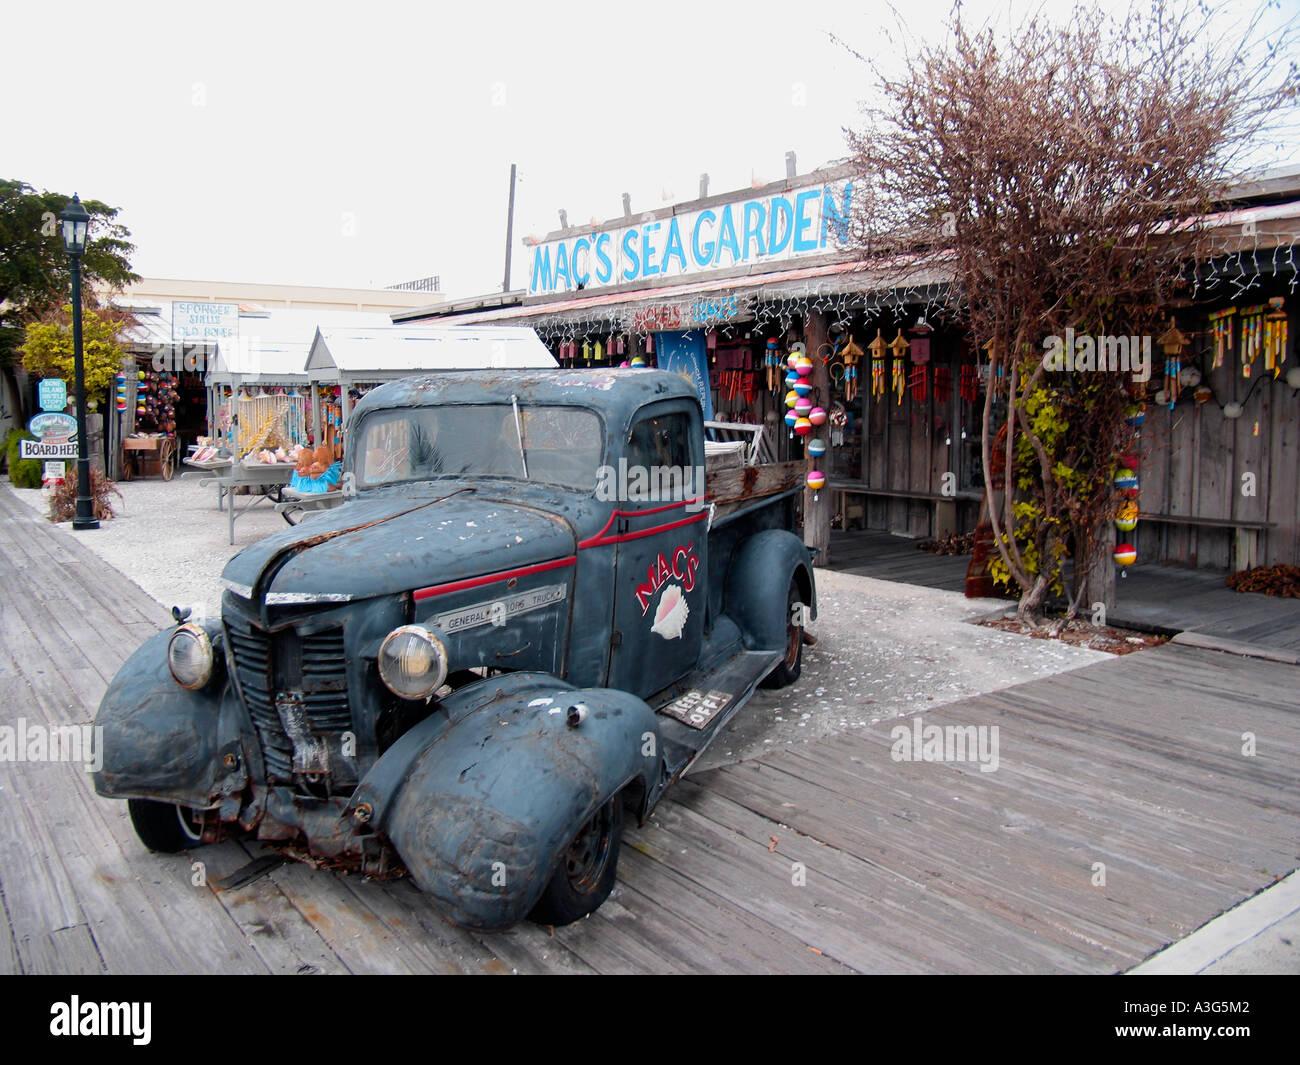 Vintage General Motors Truck - Stock Image